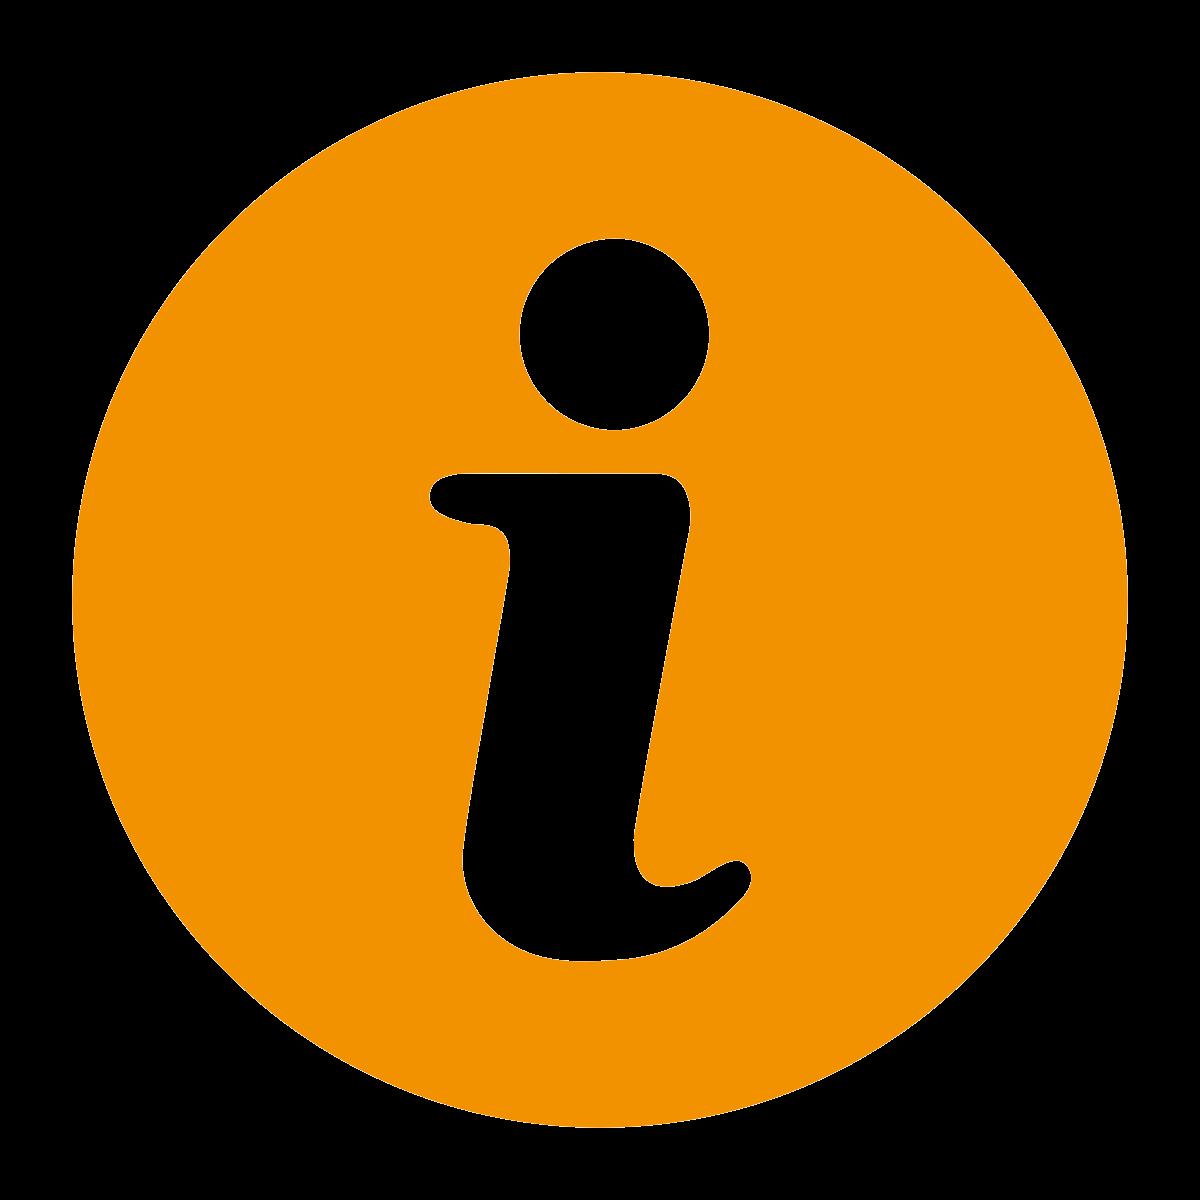 noun_Information_165883_f39200